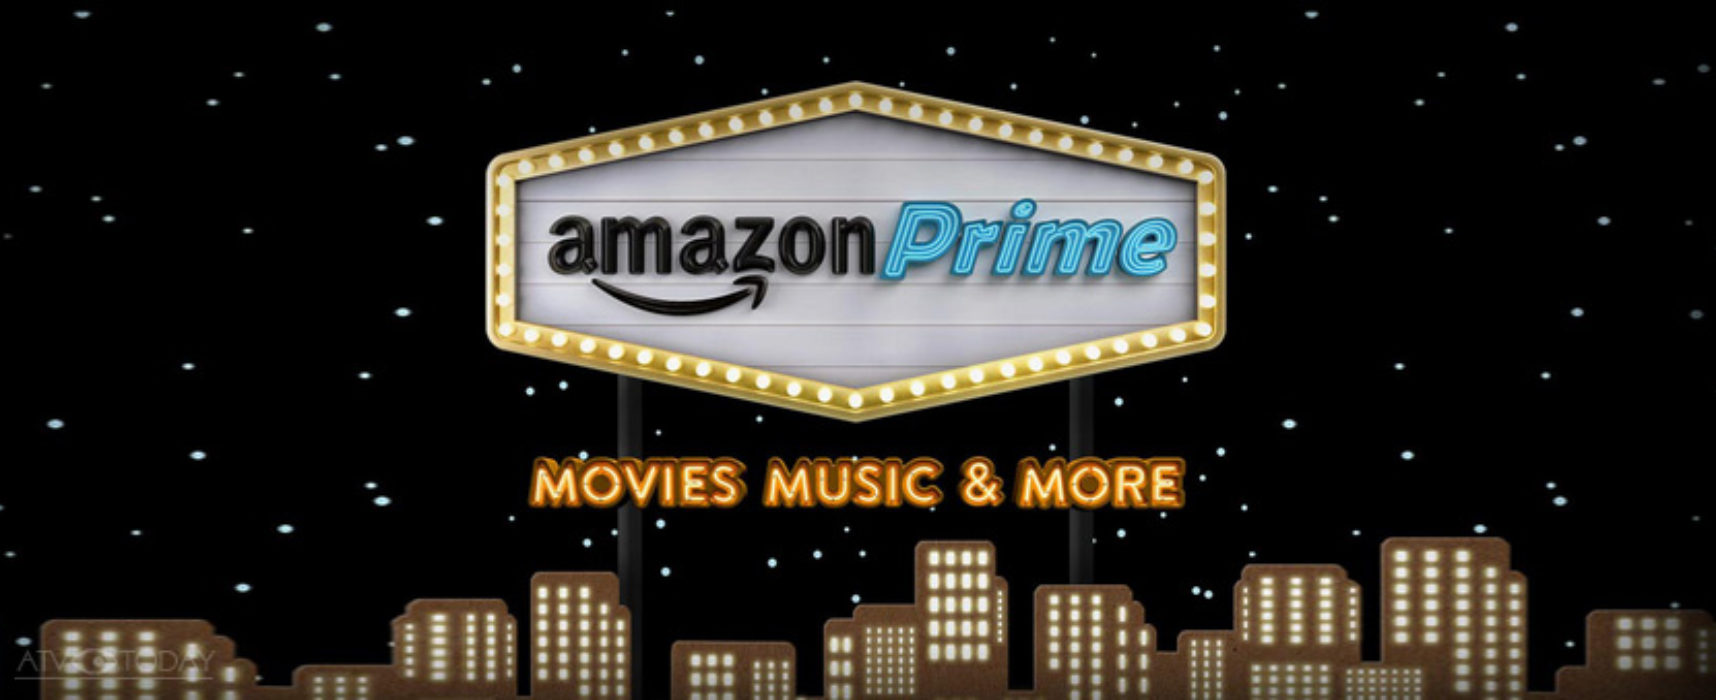 Amazon Prime presents The Family Man starring Manoj Bajpayee